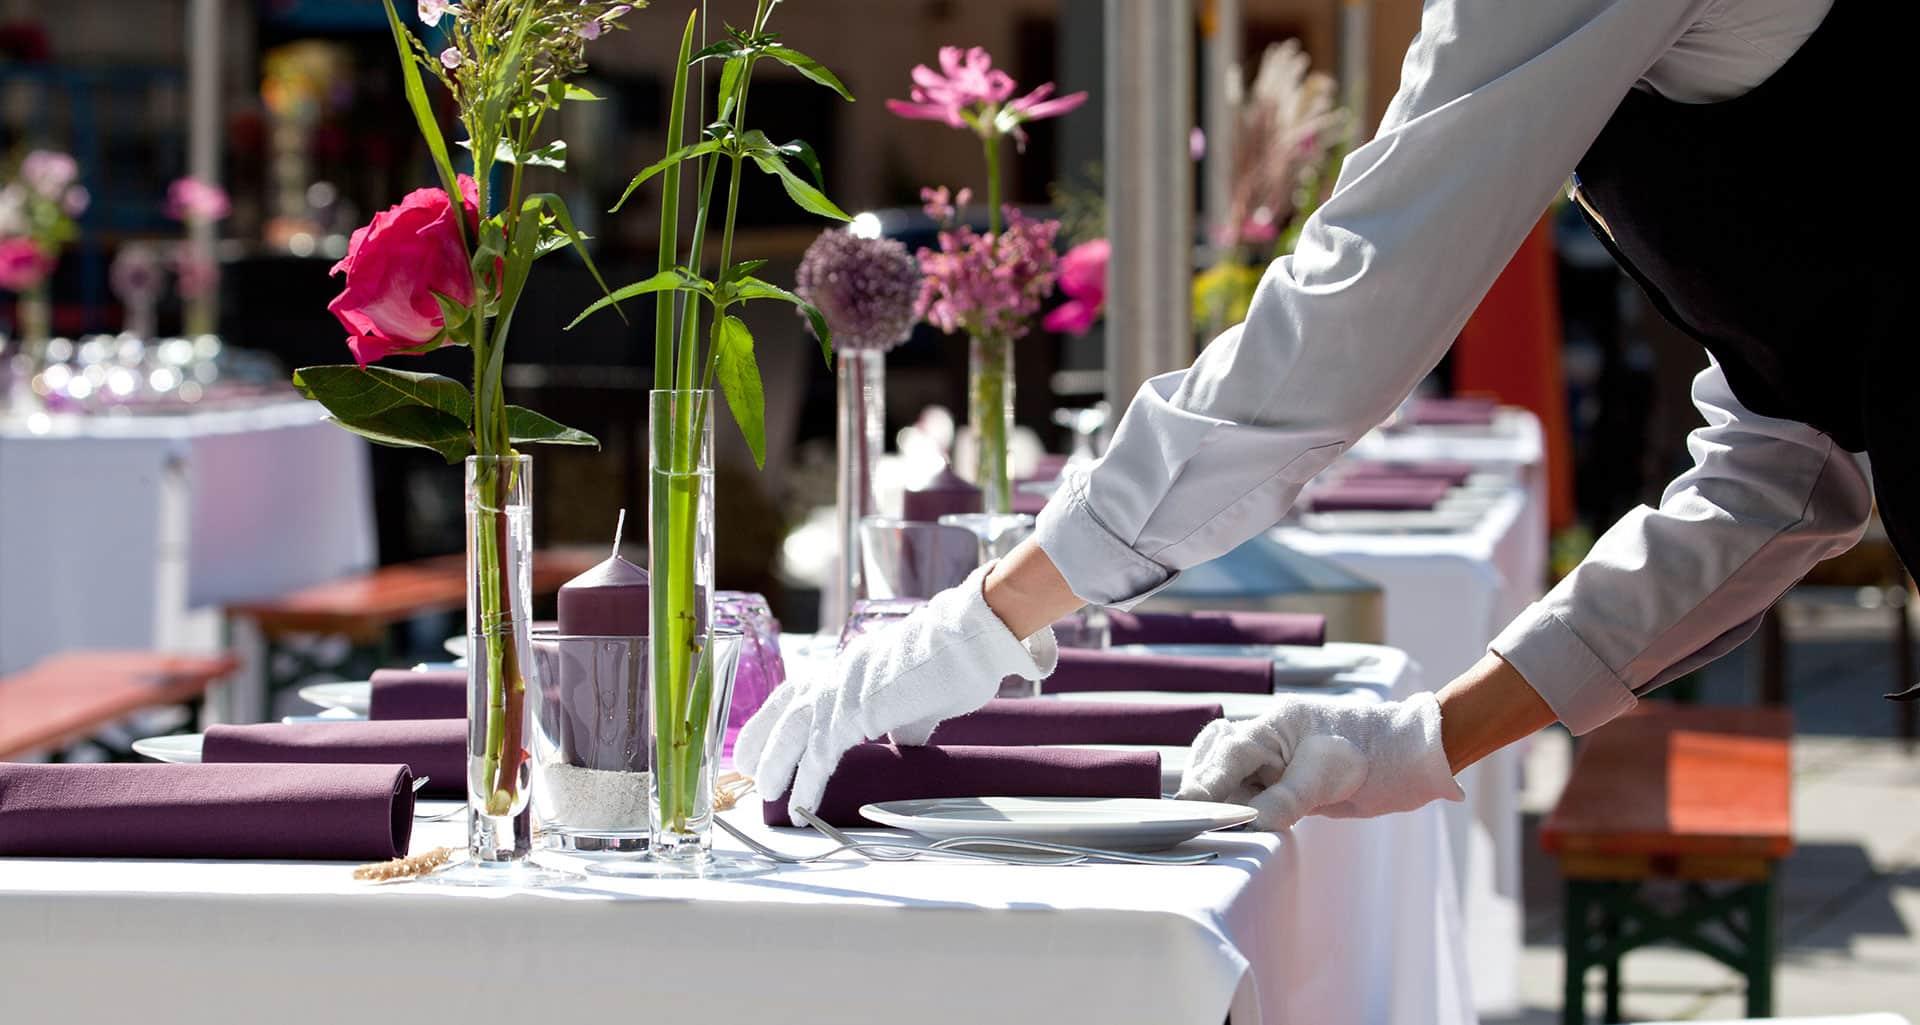 eventpersonal-servicepersonal-cateringpersonal-messehostess-servicekraft-mieten